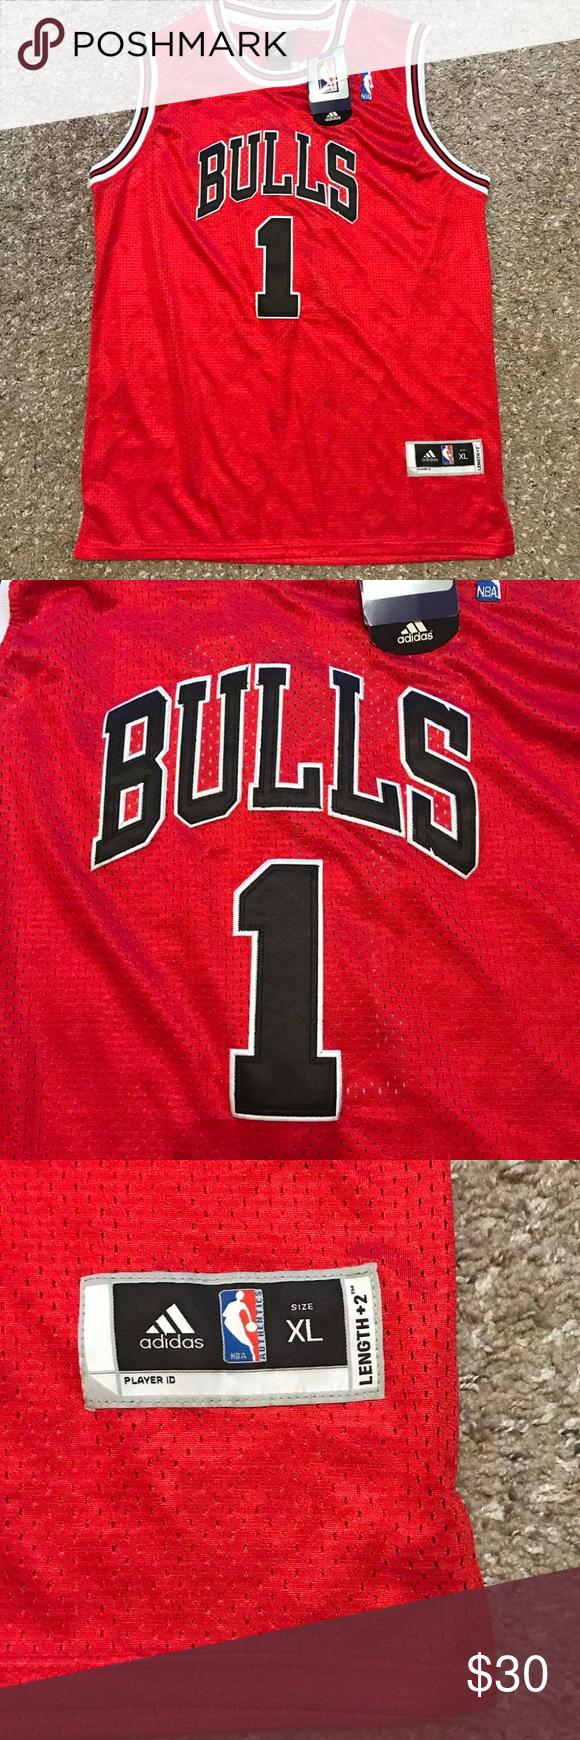 new arrival 9c34a 9a4e7 Derrick Rose Adidas NBA Jersey Chicago Bulls Get this ...